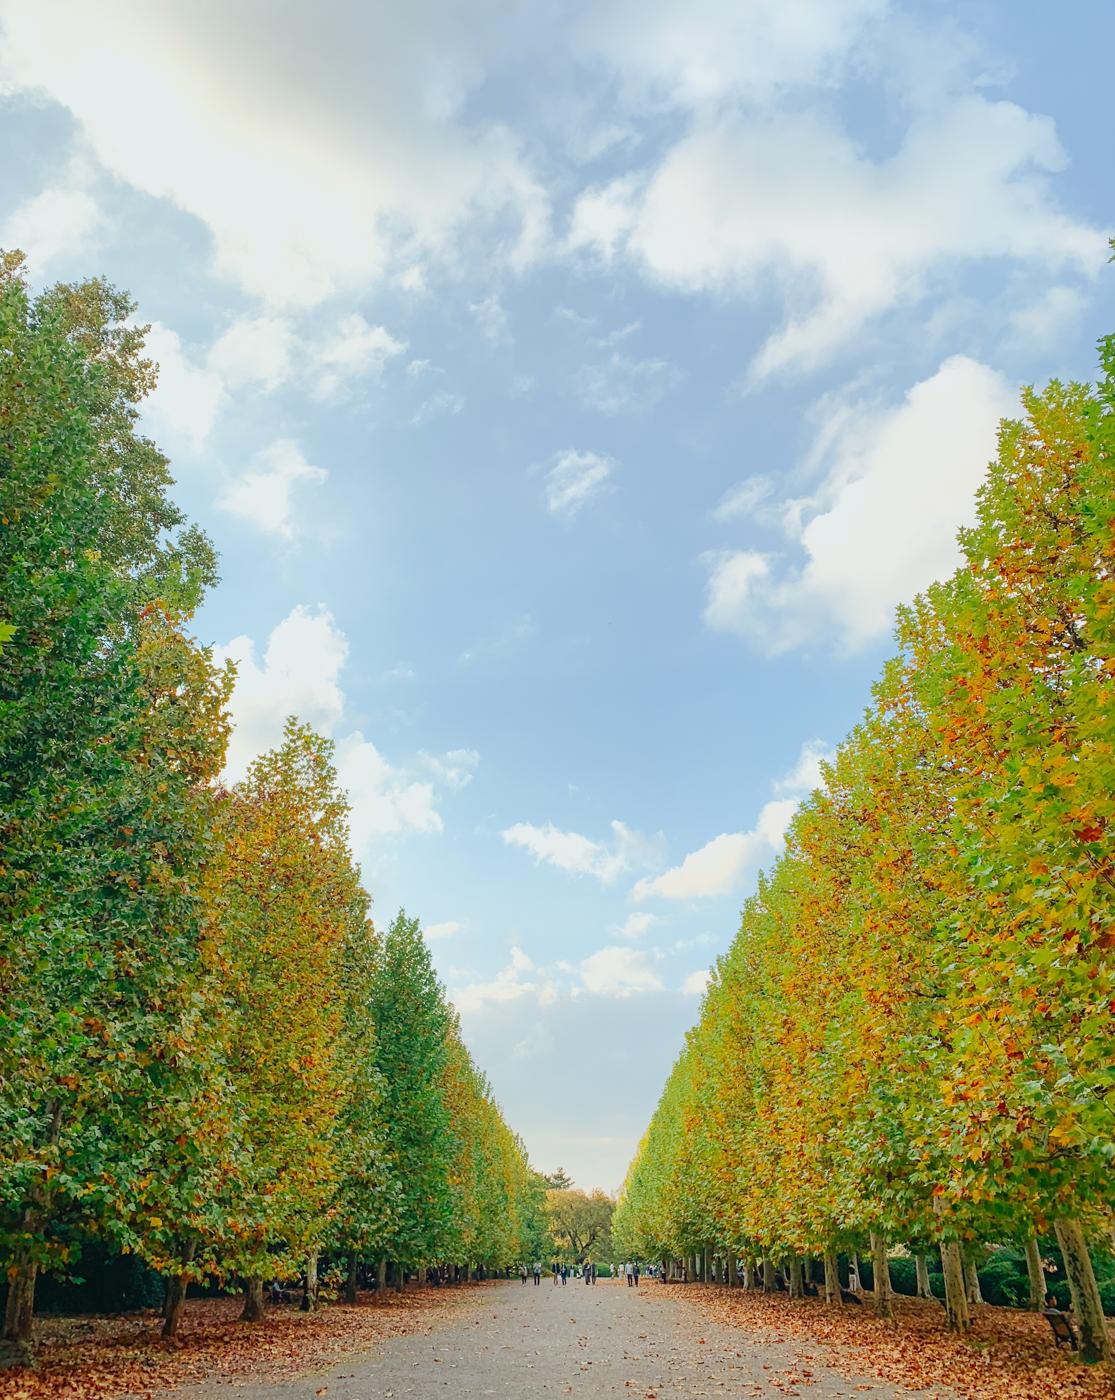 Shinjuku Gyoen National Garden | Tokyo, Japan Travel Guide | The Chic Diary